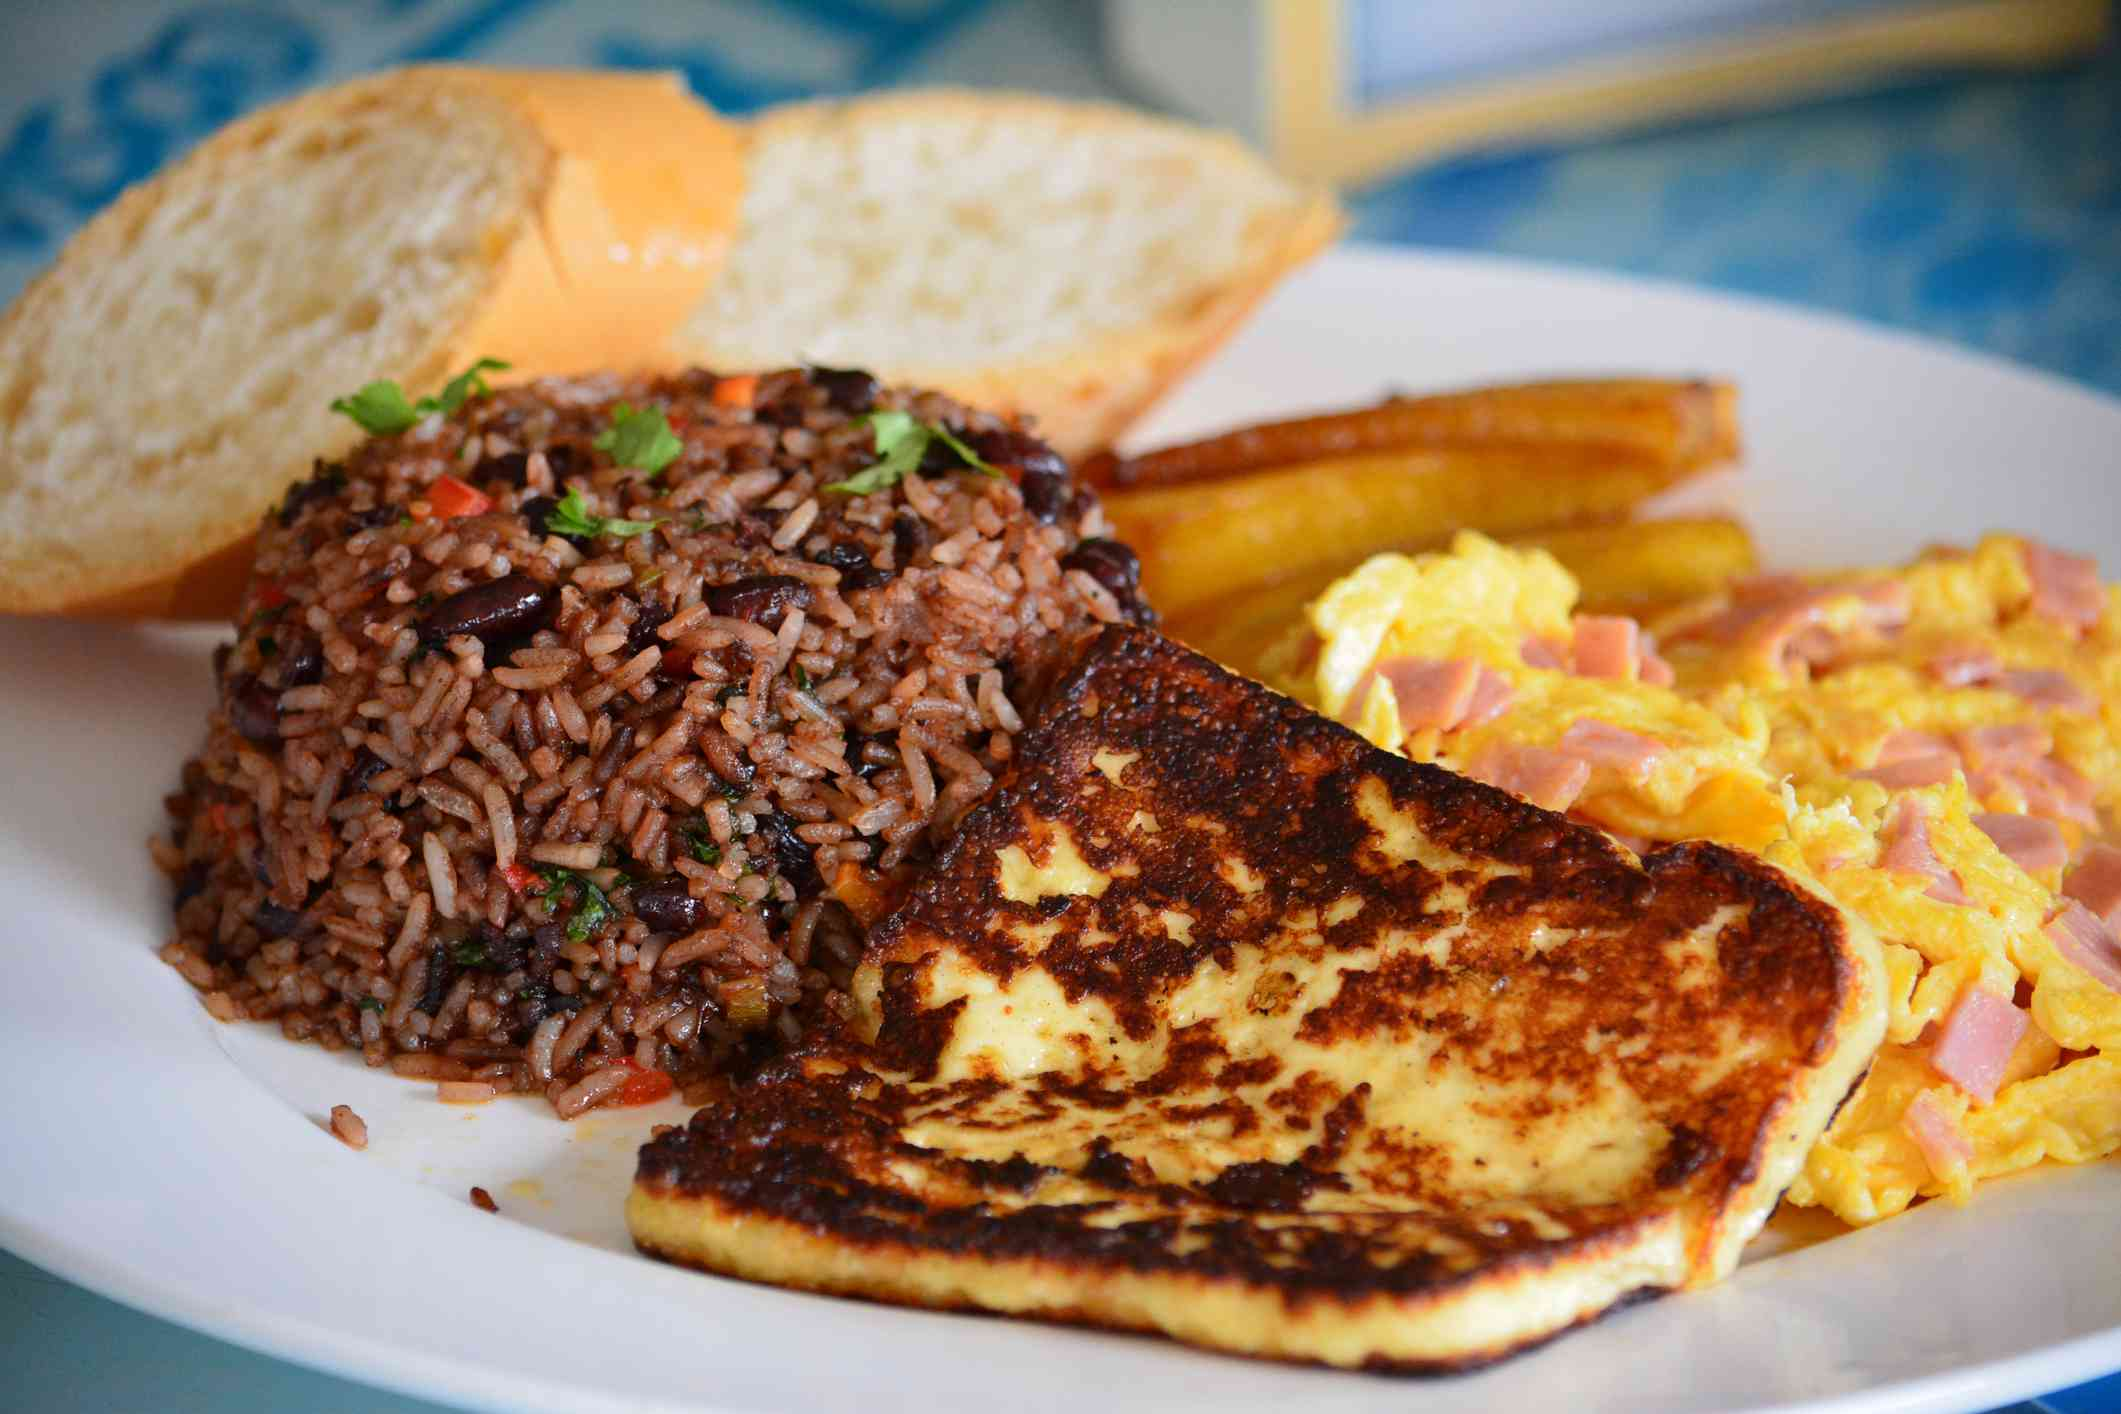 Comida típica en Costa Rica, desayuno Gallo Pinto